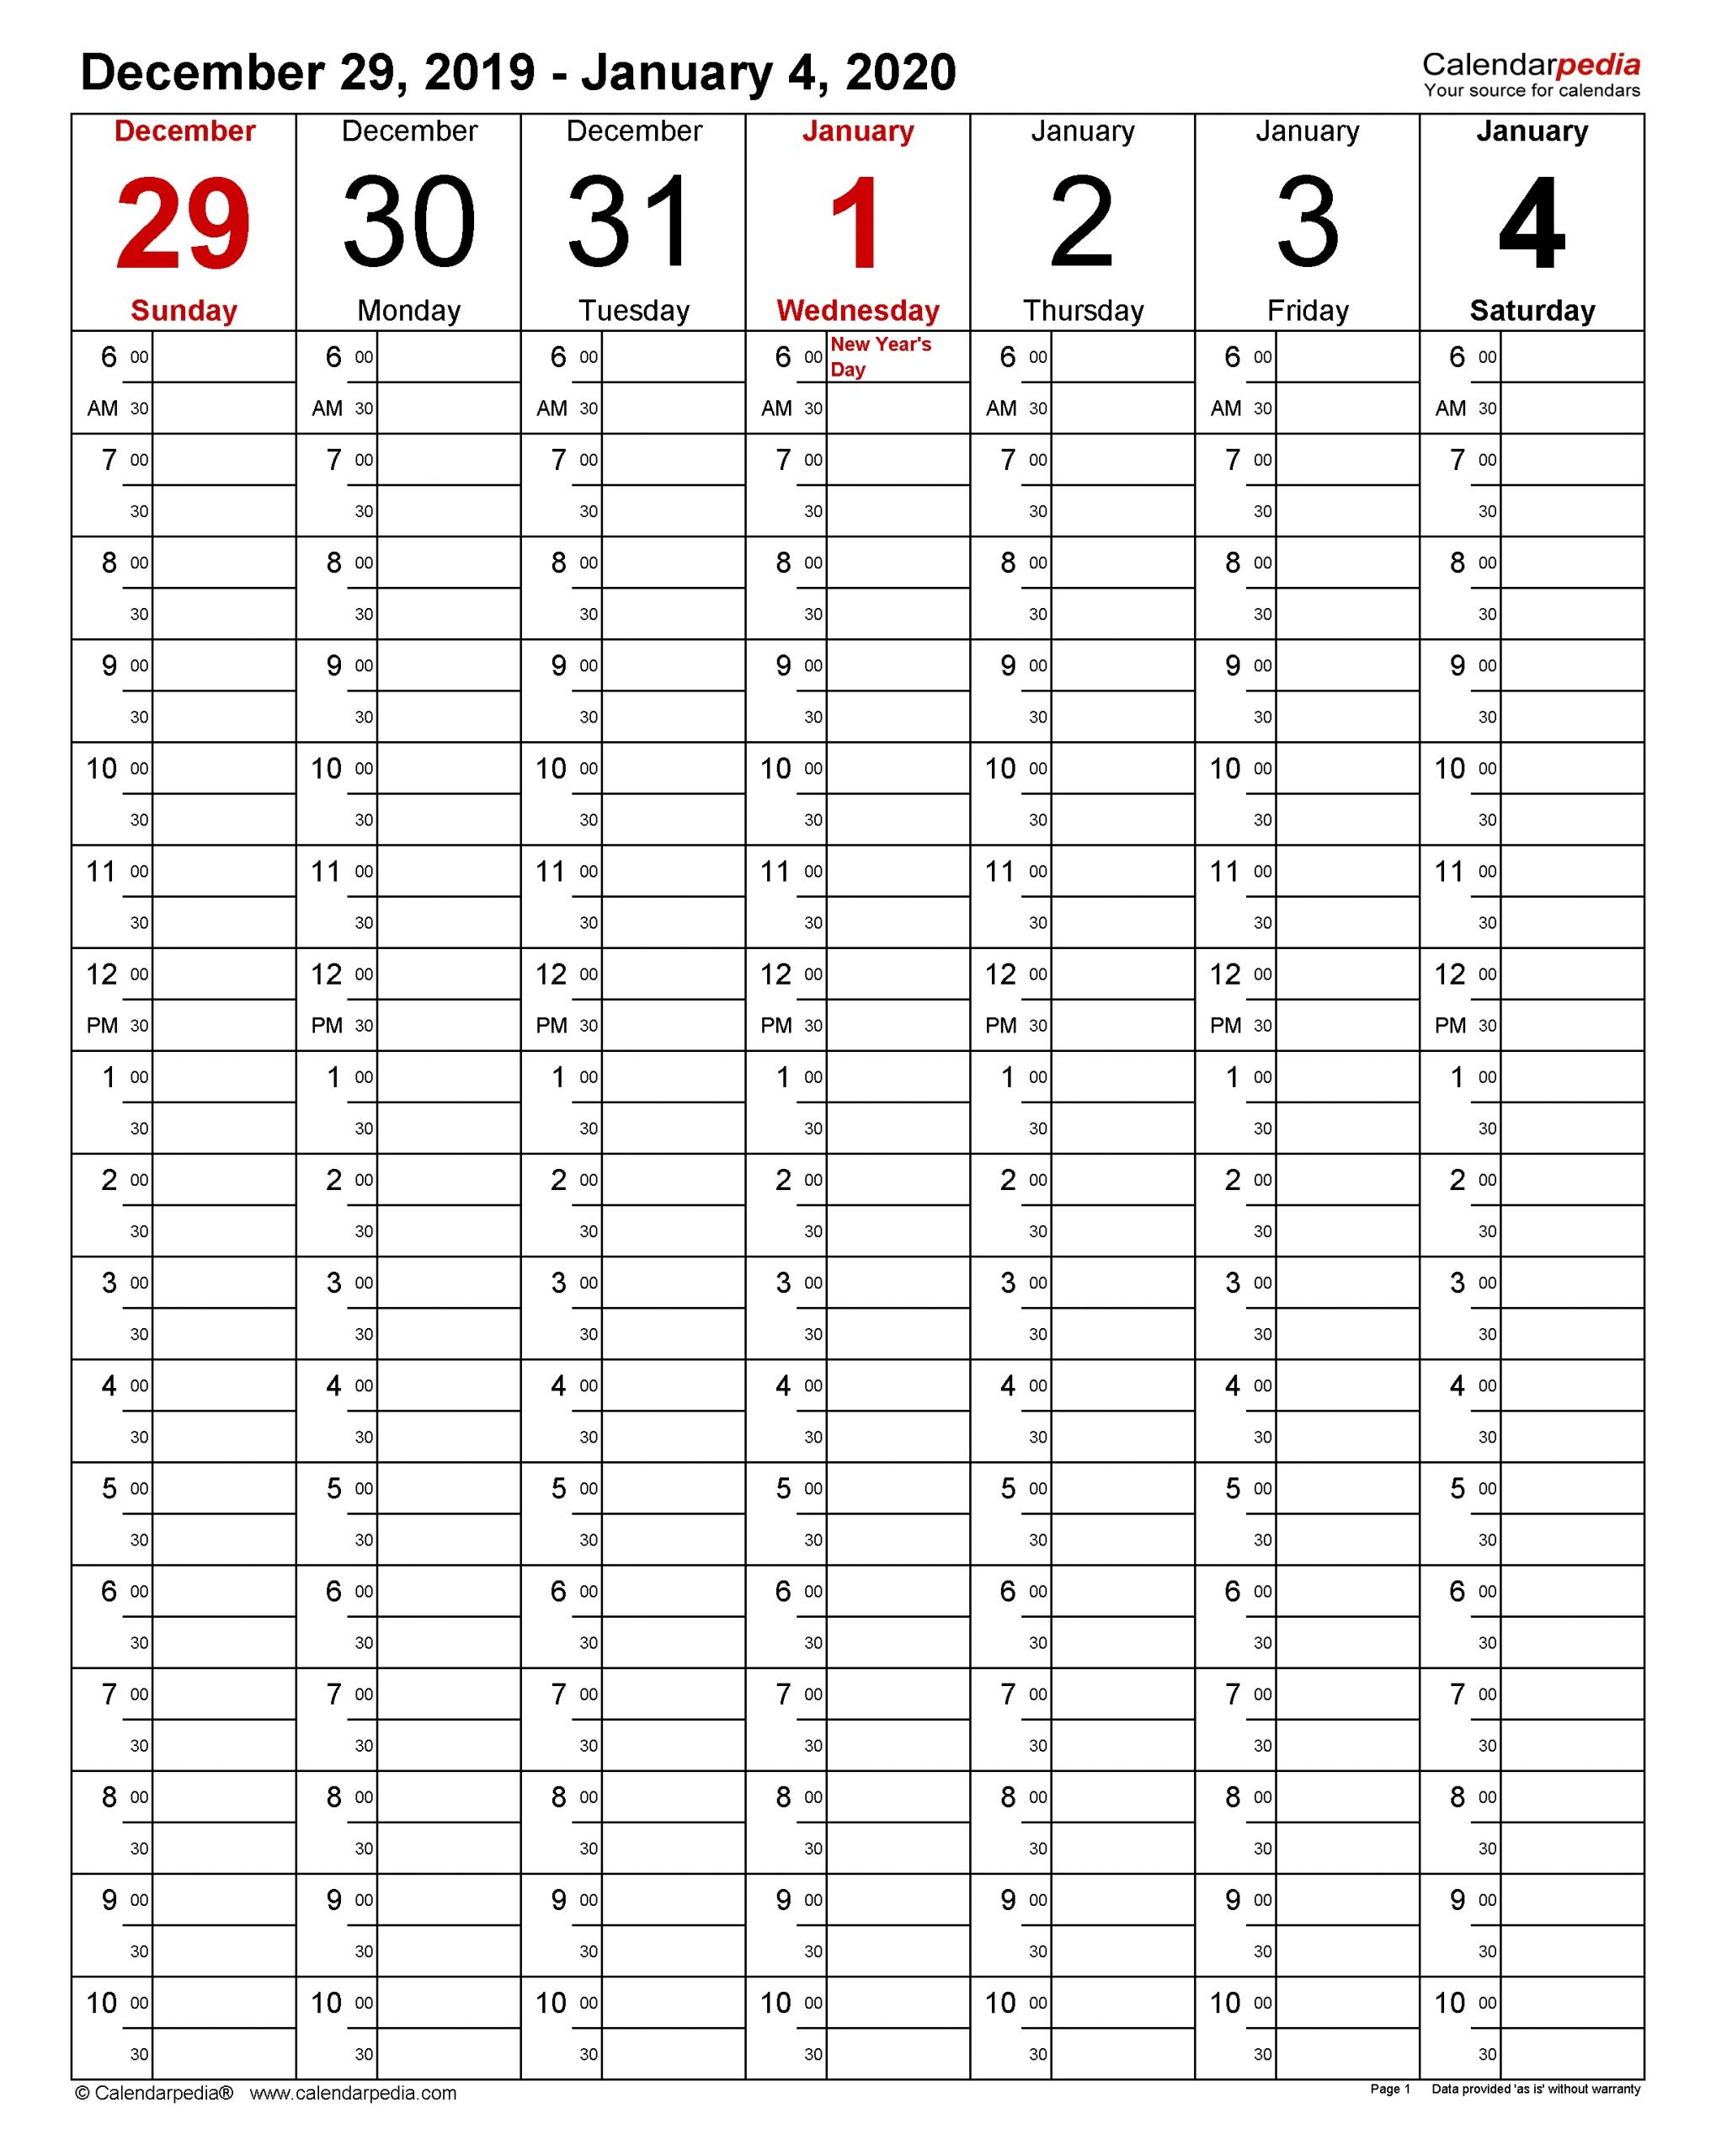 Weekly Calendars 2020 For Word - 12 Free Printable Templates inside 2020 Calendar Printable Free Word Monthly